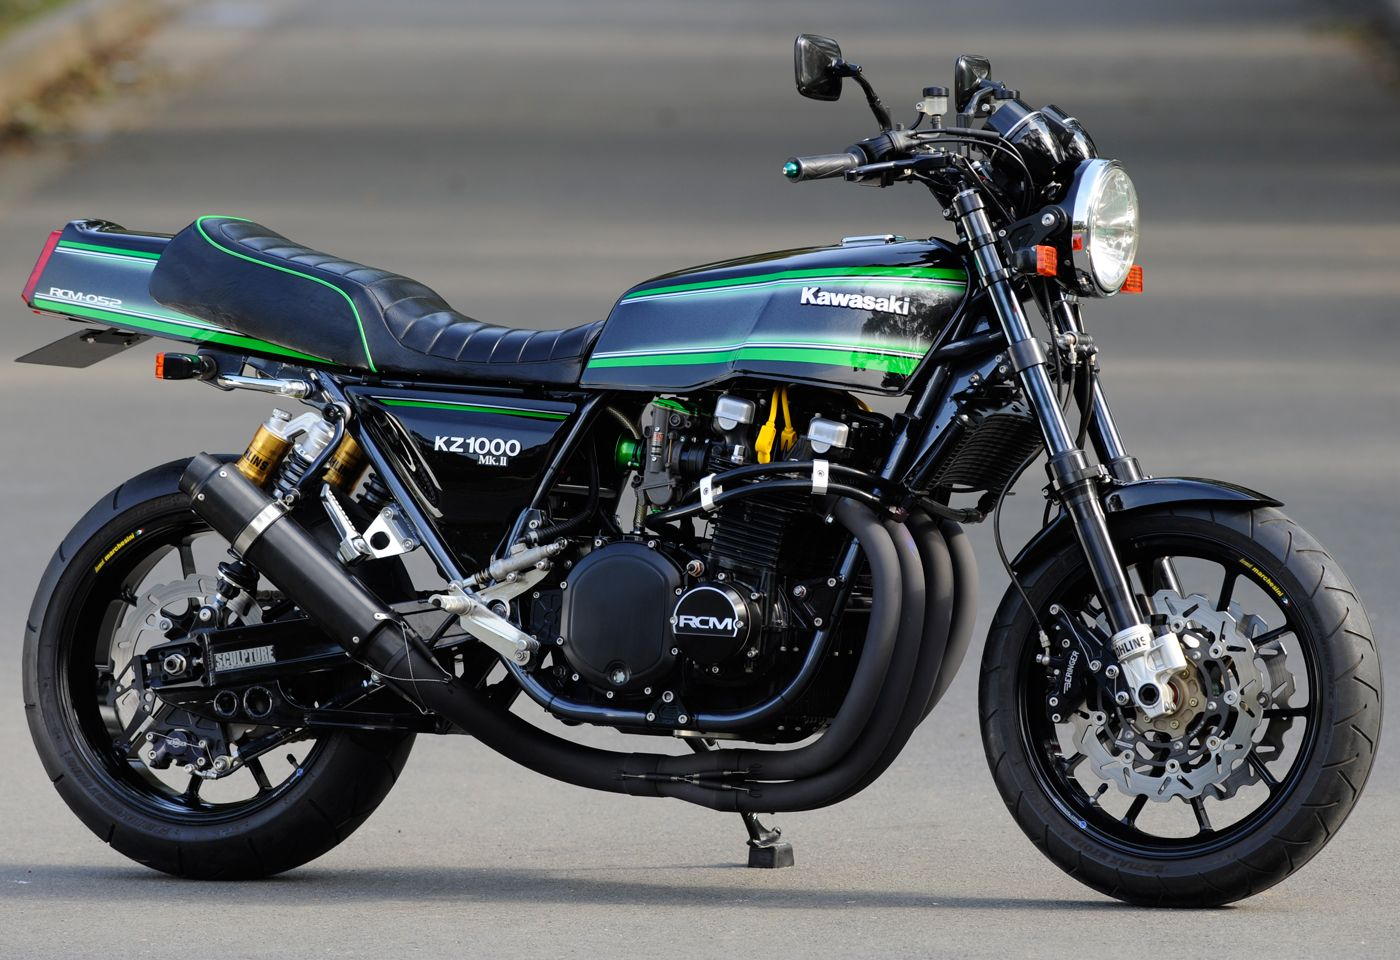 Rcm 052 Remake Kz1000mk カワサキモーターサイクル 旧車バイク 川崎バイク